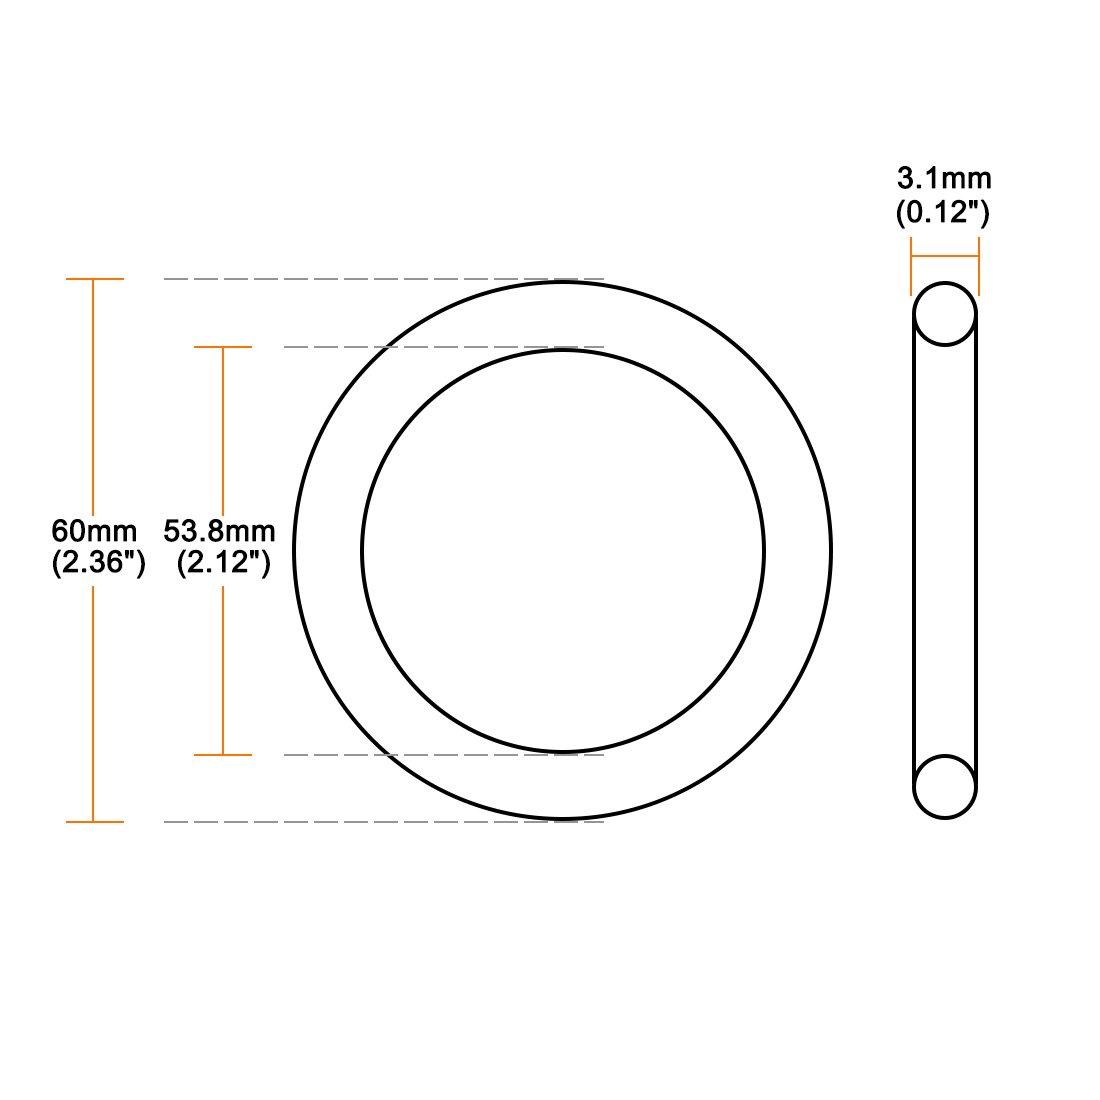 a18032900ux0270 anillos de sellado de juntas rojas Junta t/órica de silicona 8 mm a 32 mm de di/ámetro exterior Sourcingmap